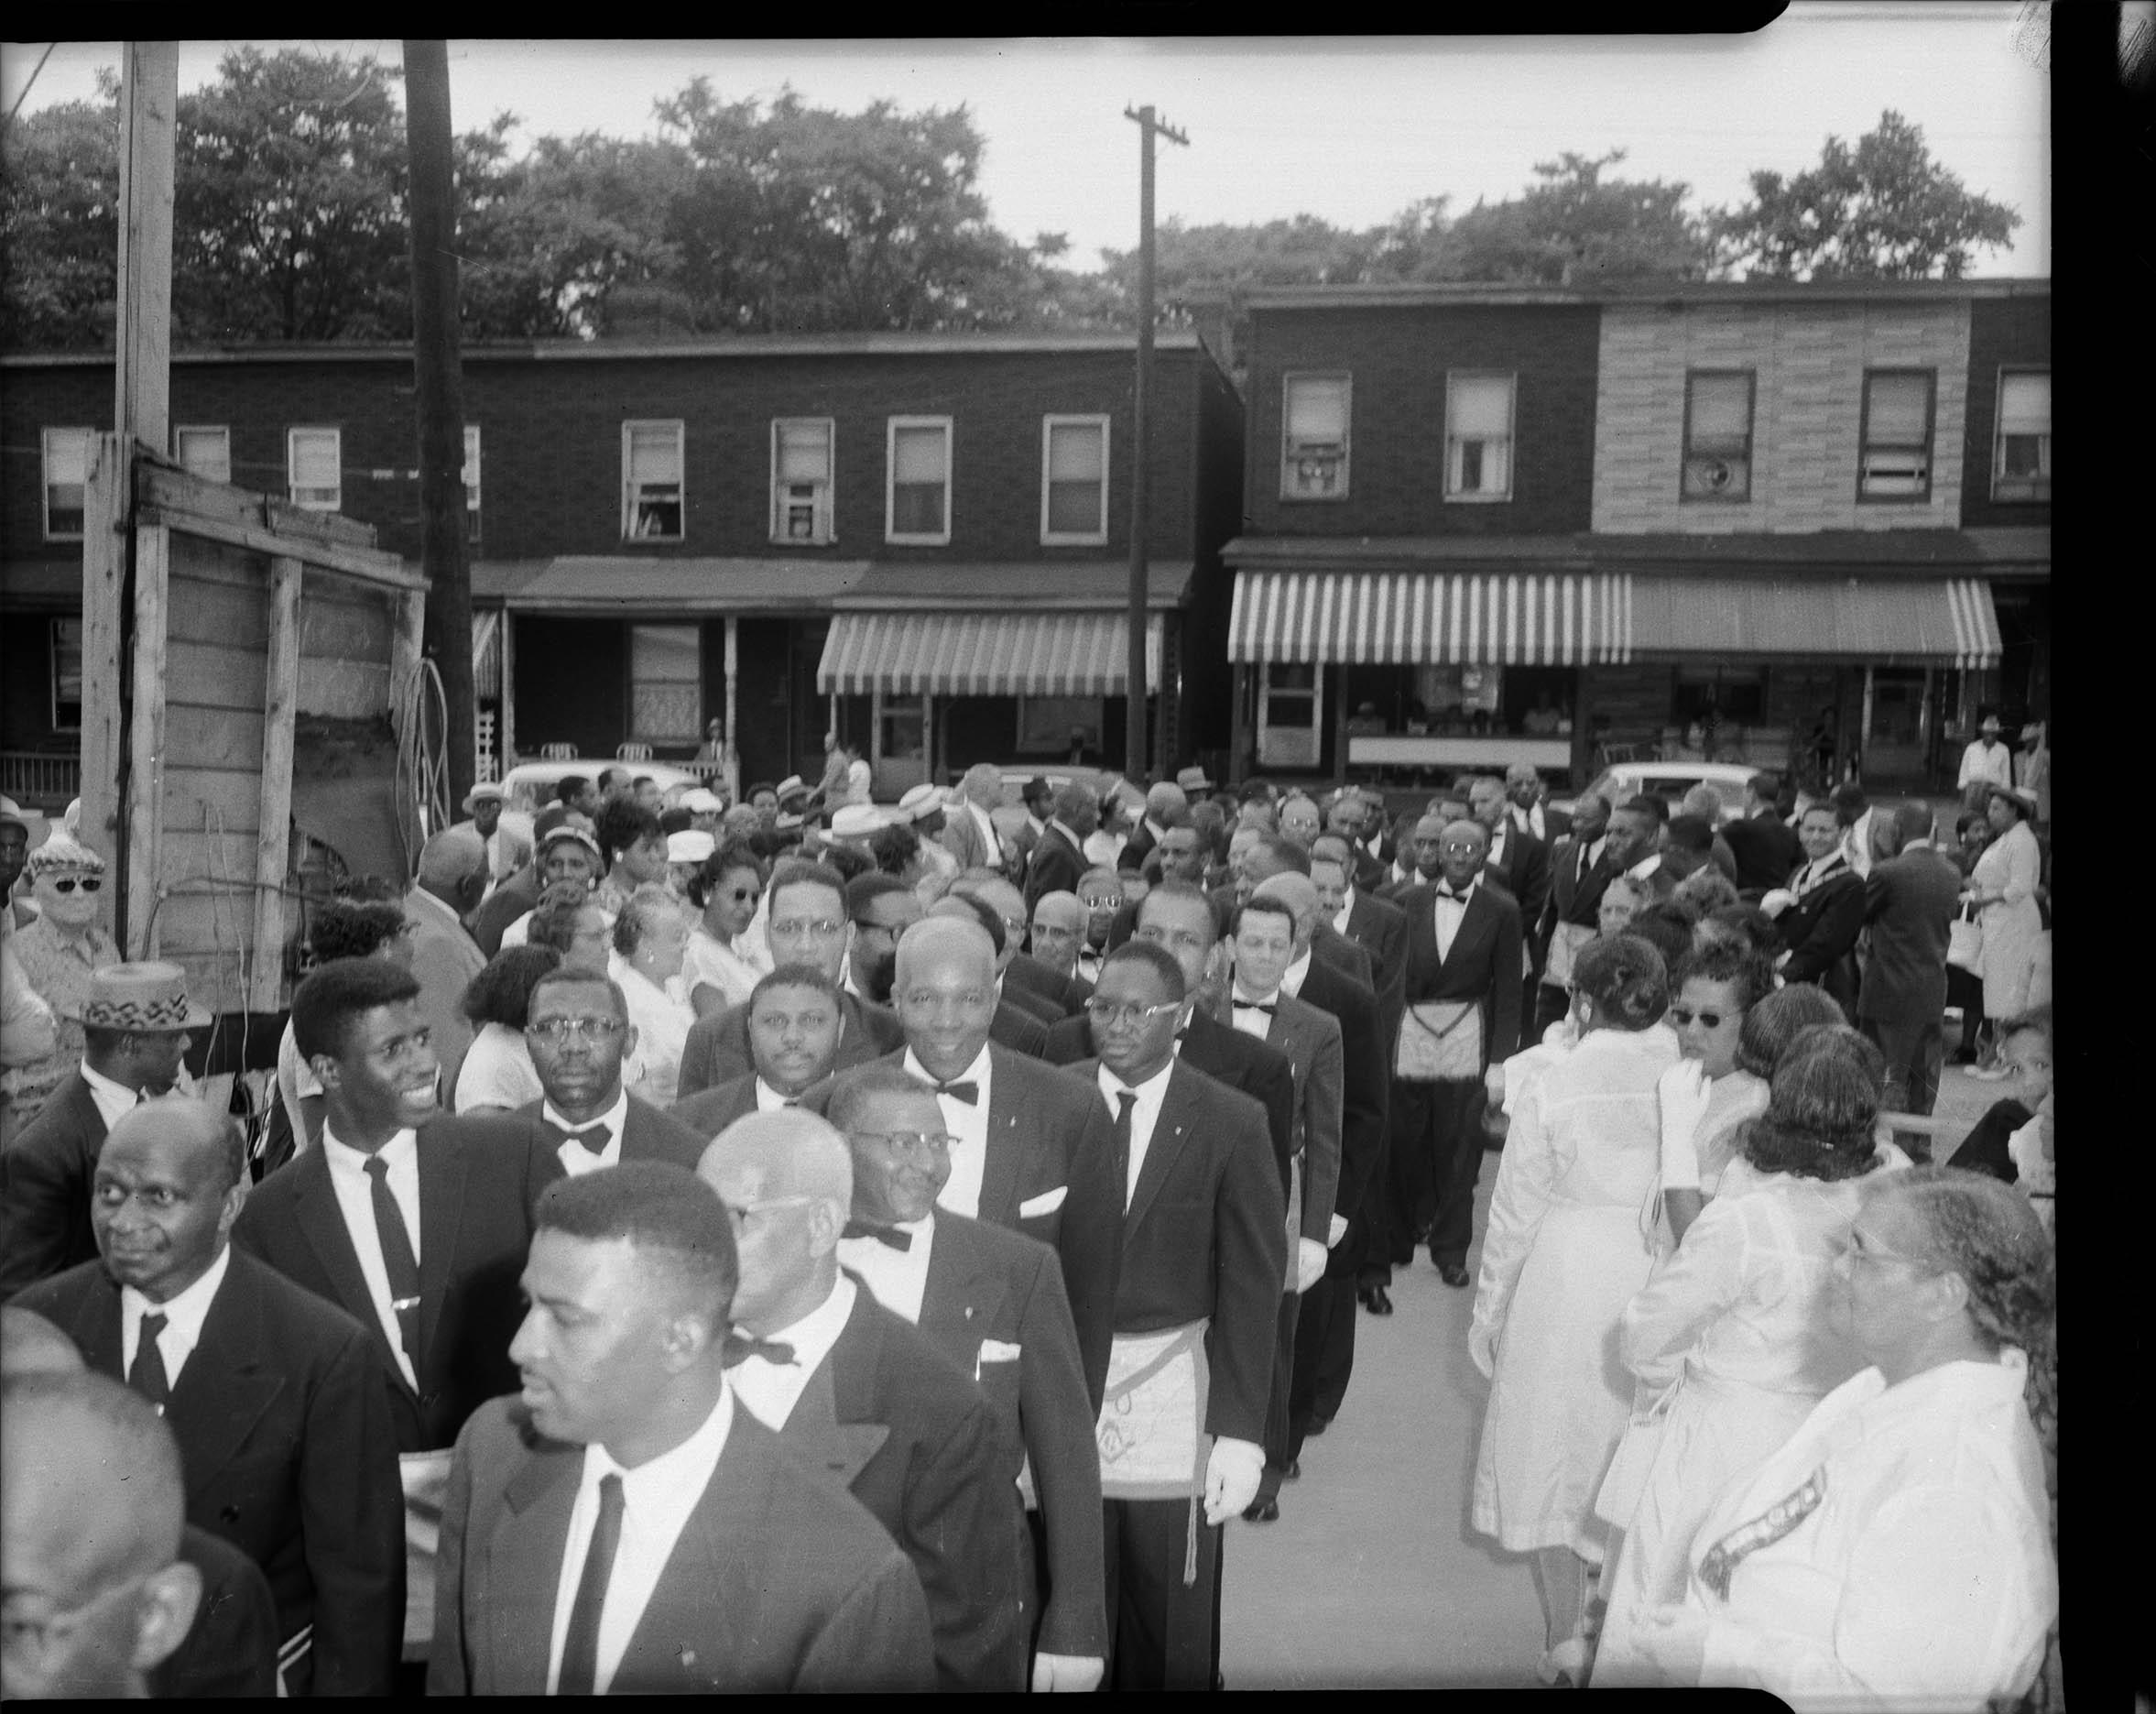 Men wearing Masonic aprons, walking in group, with men and women